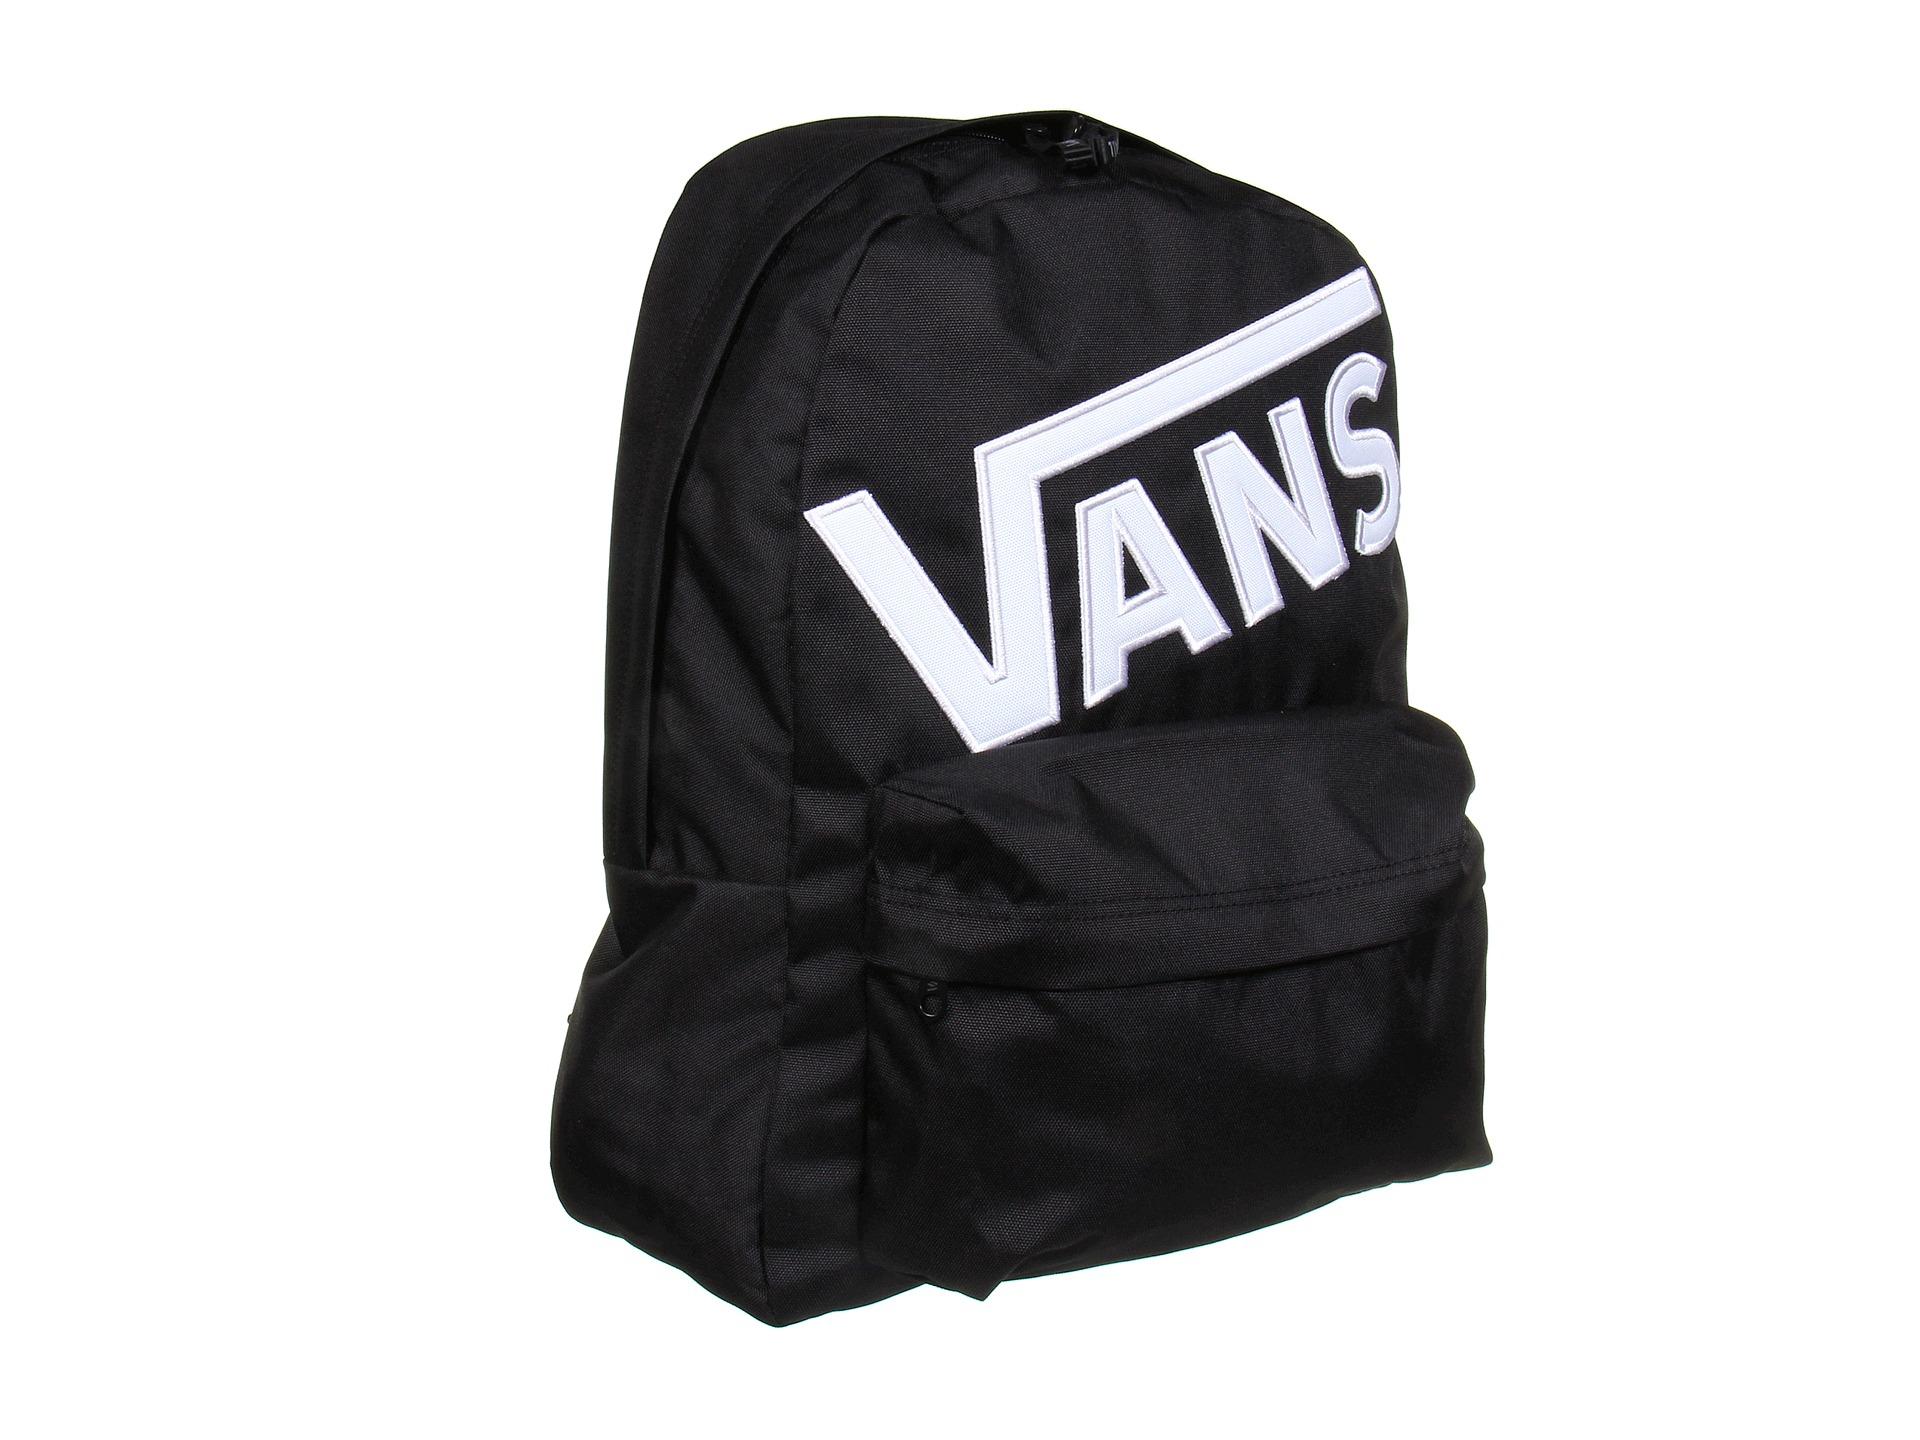 Vans Old Skool Ii Backpack In Black For Men Black White